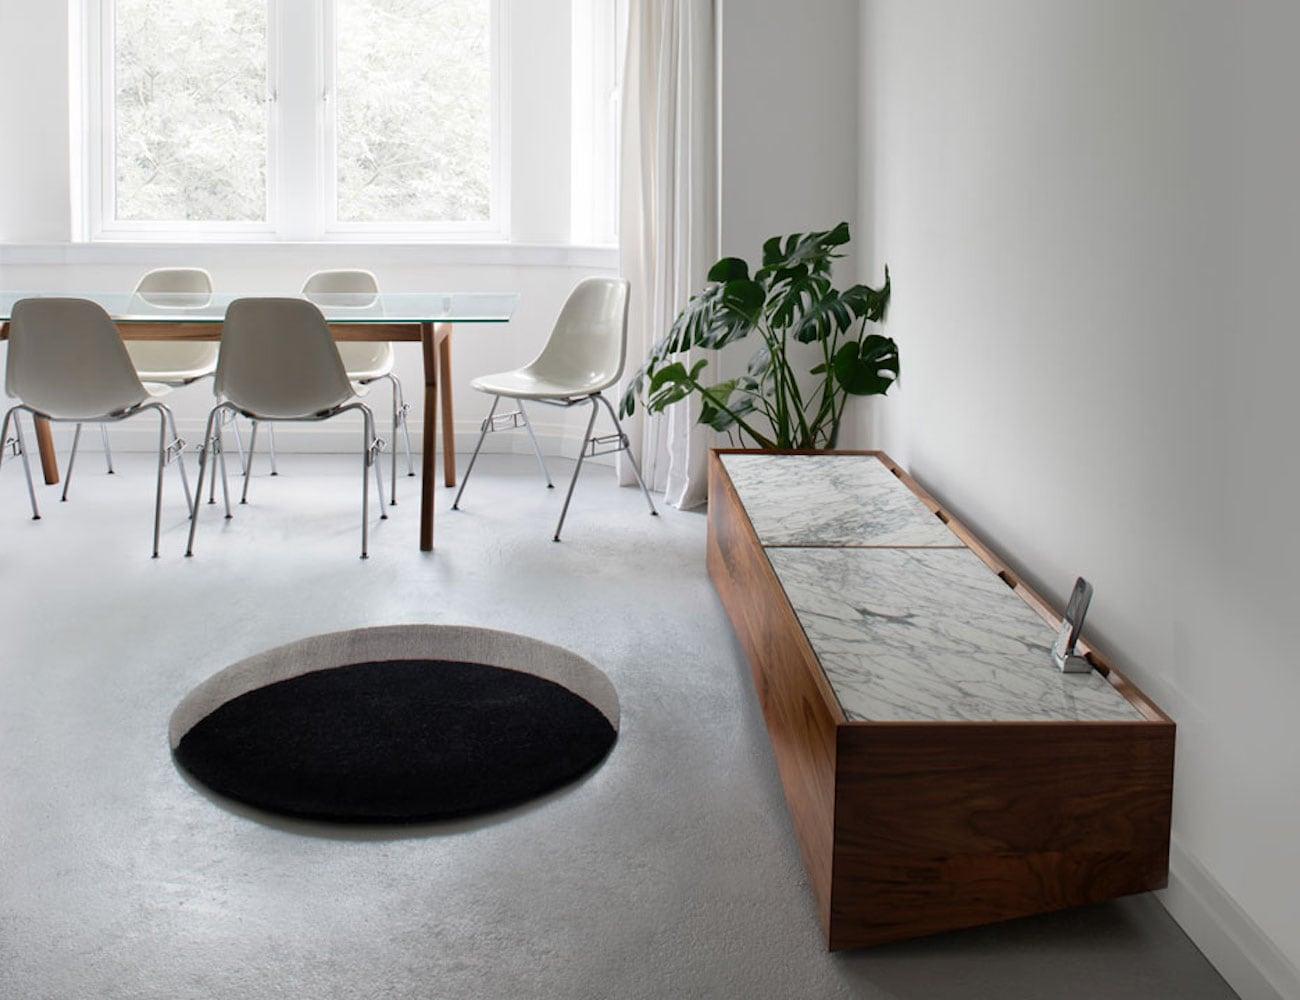 Round Void Wool Floor Rug creates the illusion of a black hole